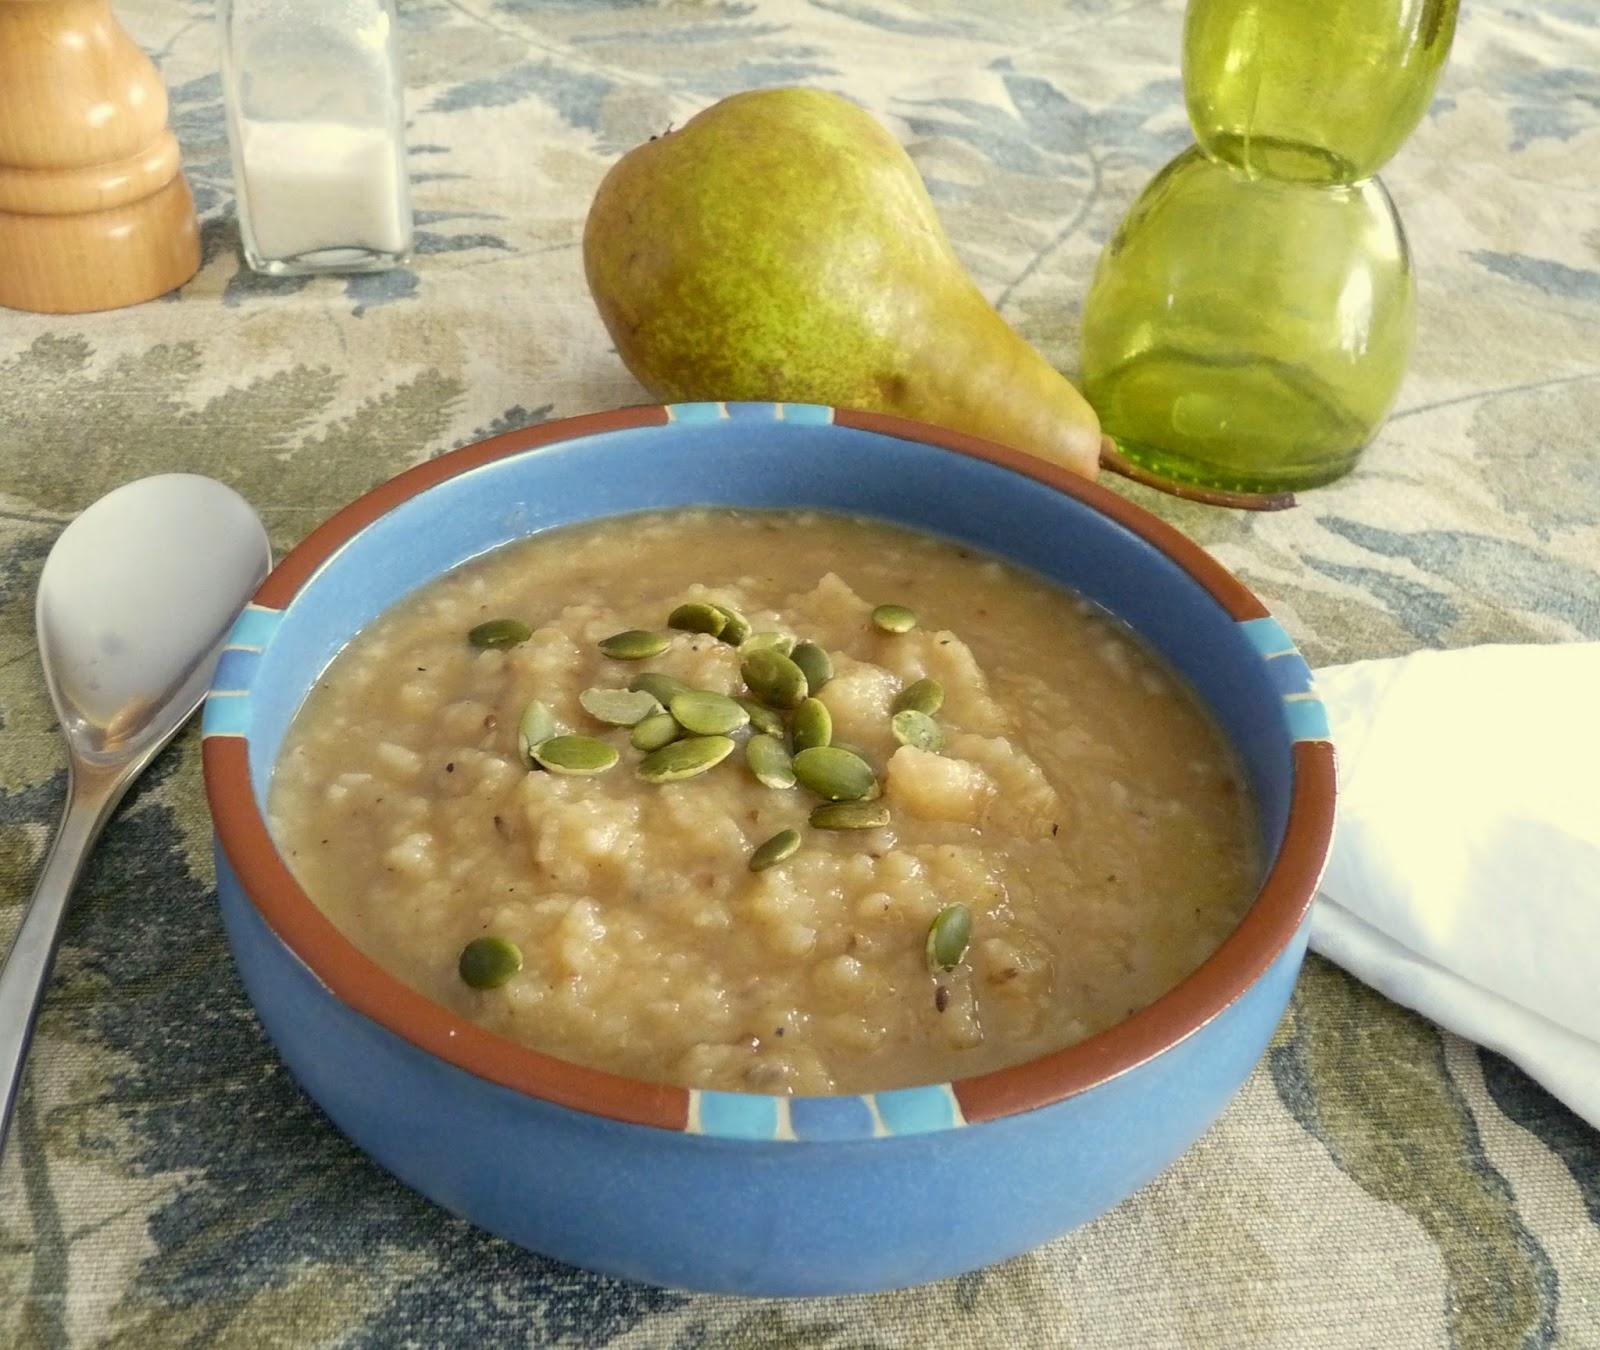 Spiced Squash & Pear Soup